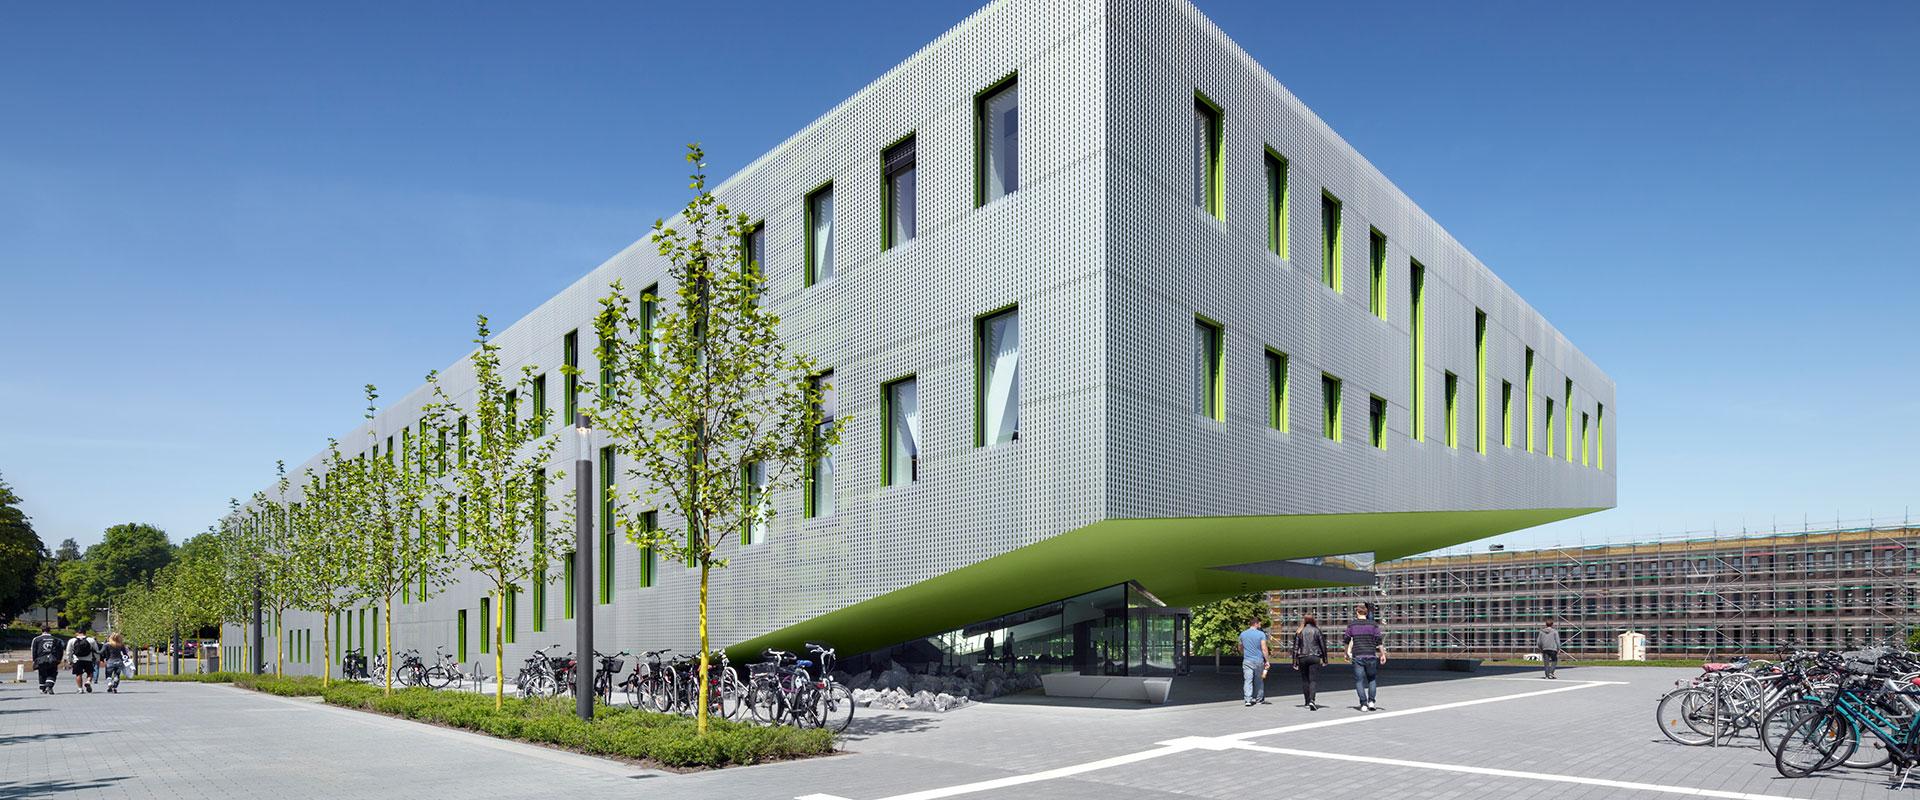 AGGLOTECH-progetto-hochschule-slider-8